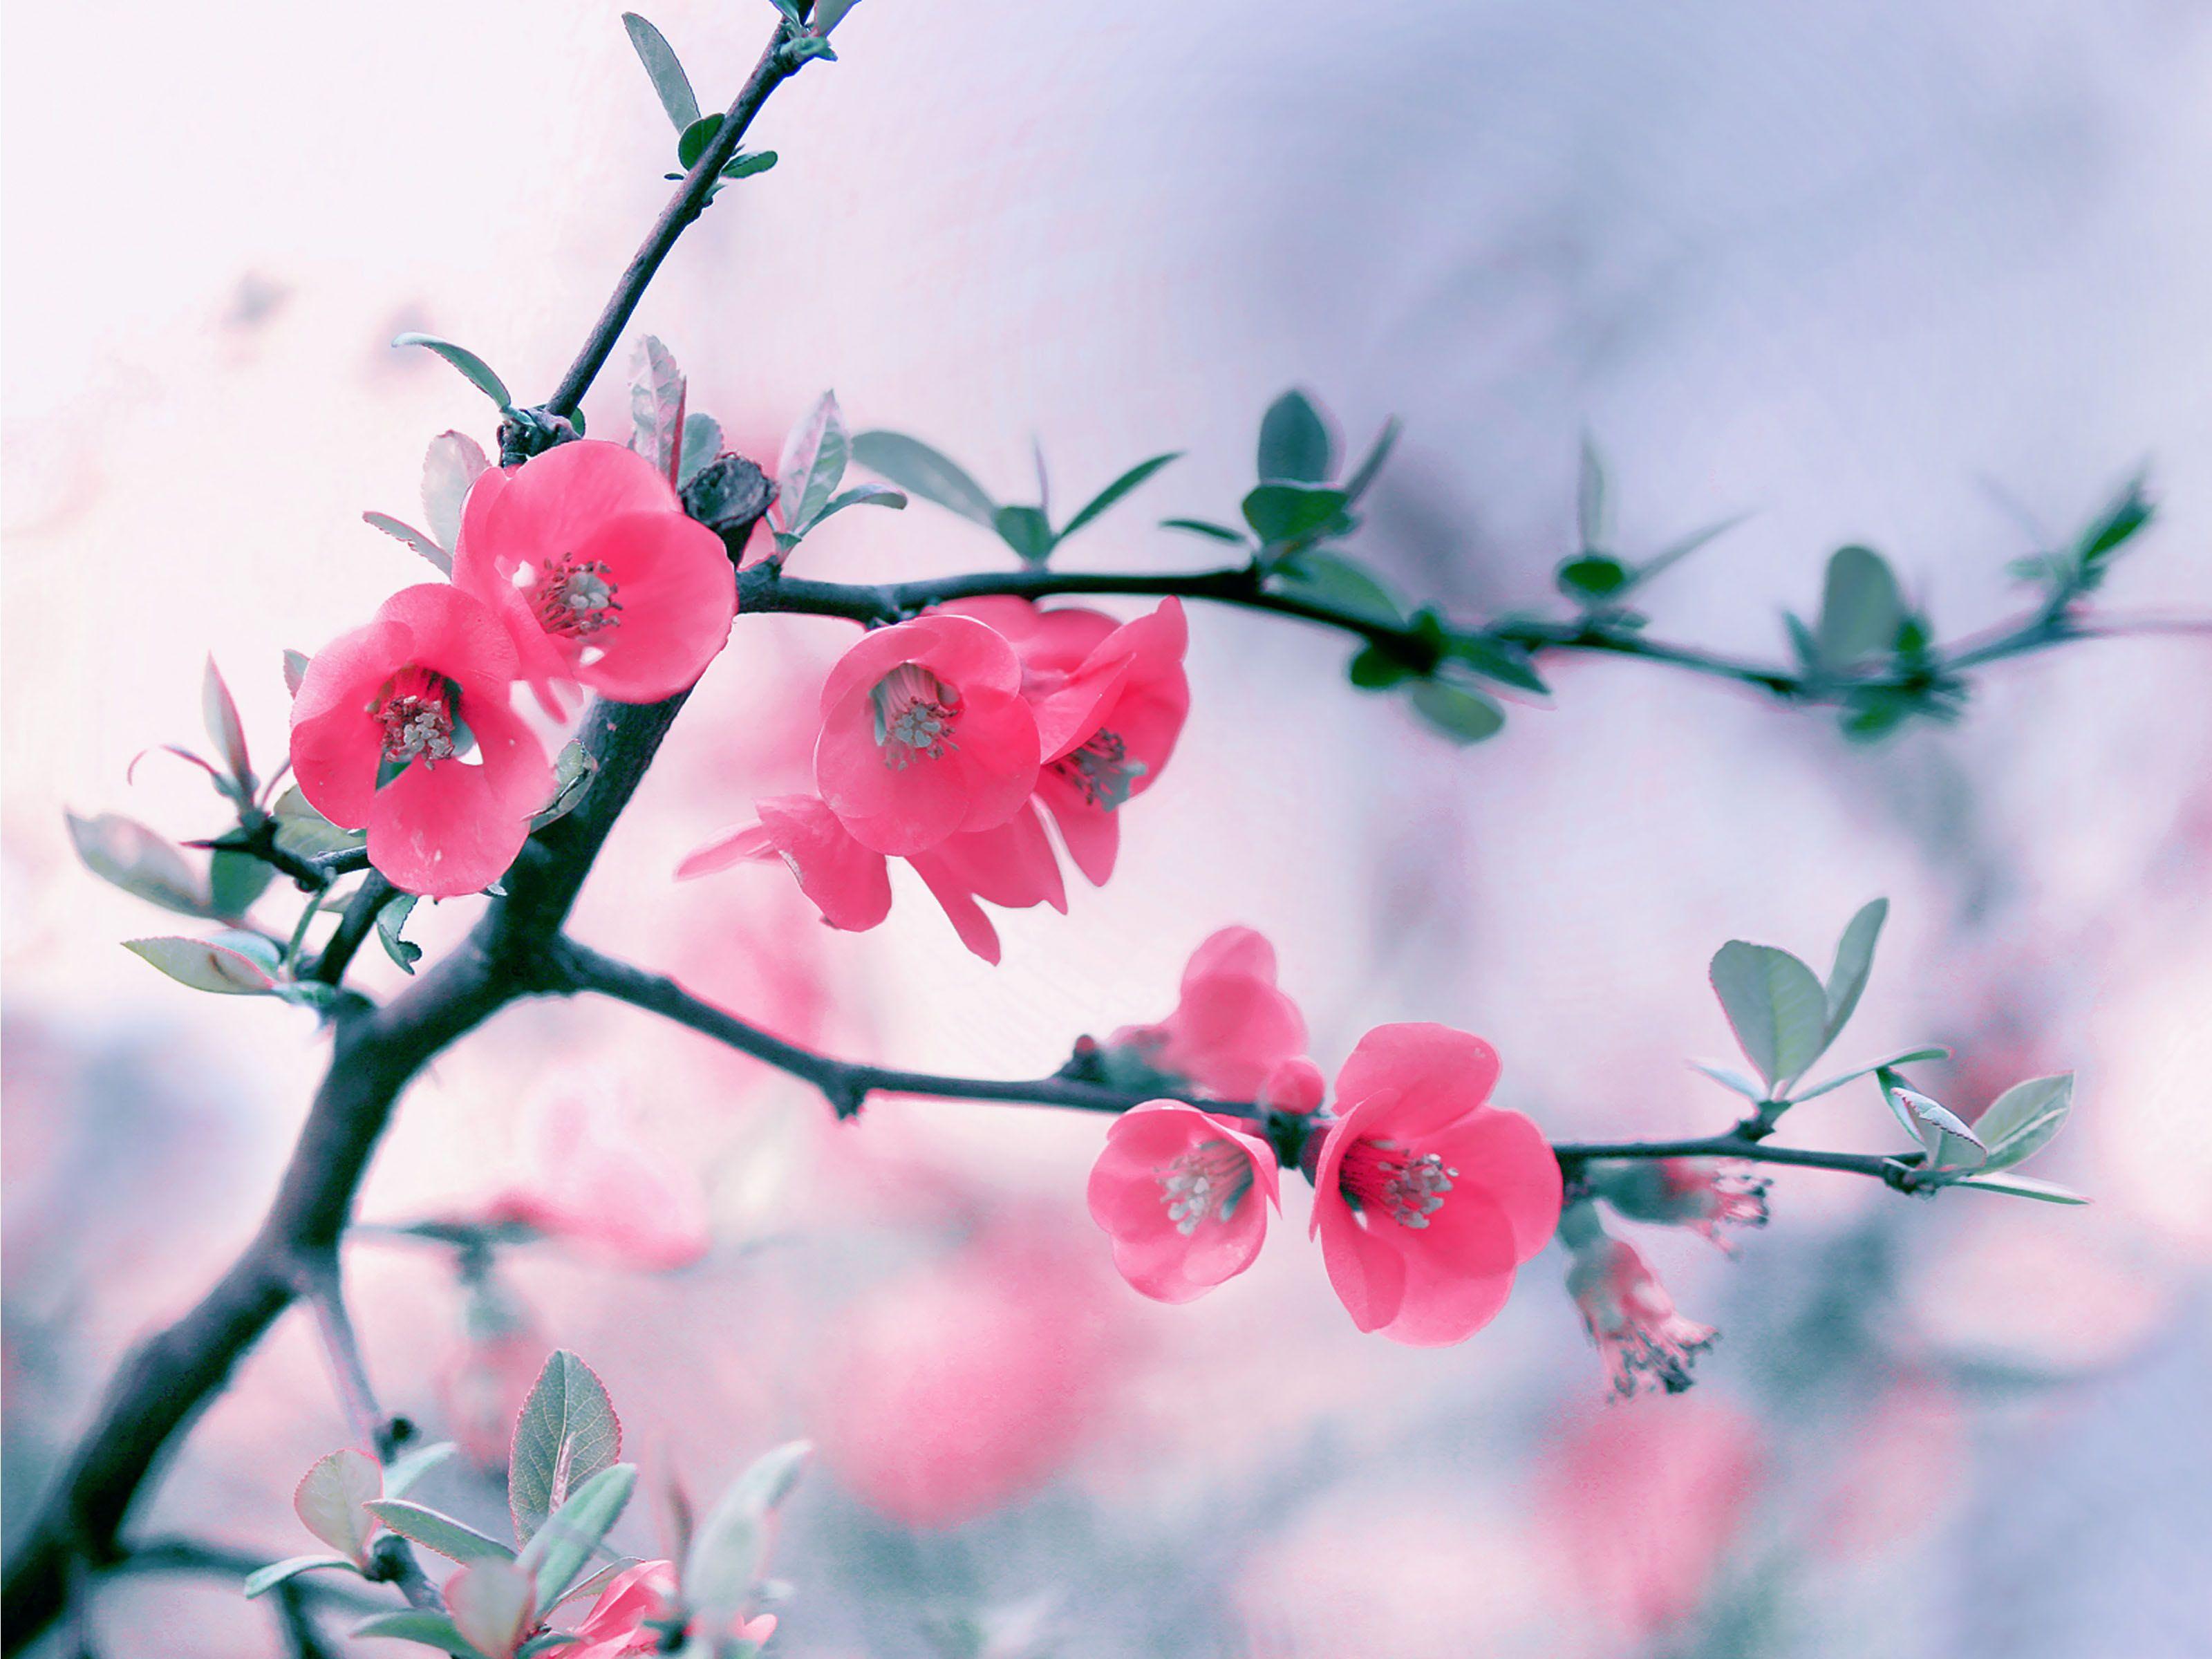 http://ustazfathulbari.files.wordpress.com/2014/05/spring-blooming-flower.jpg